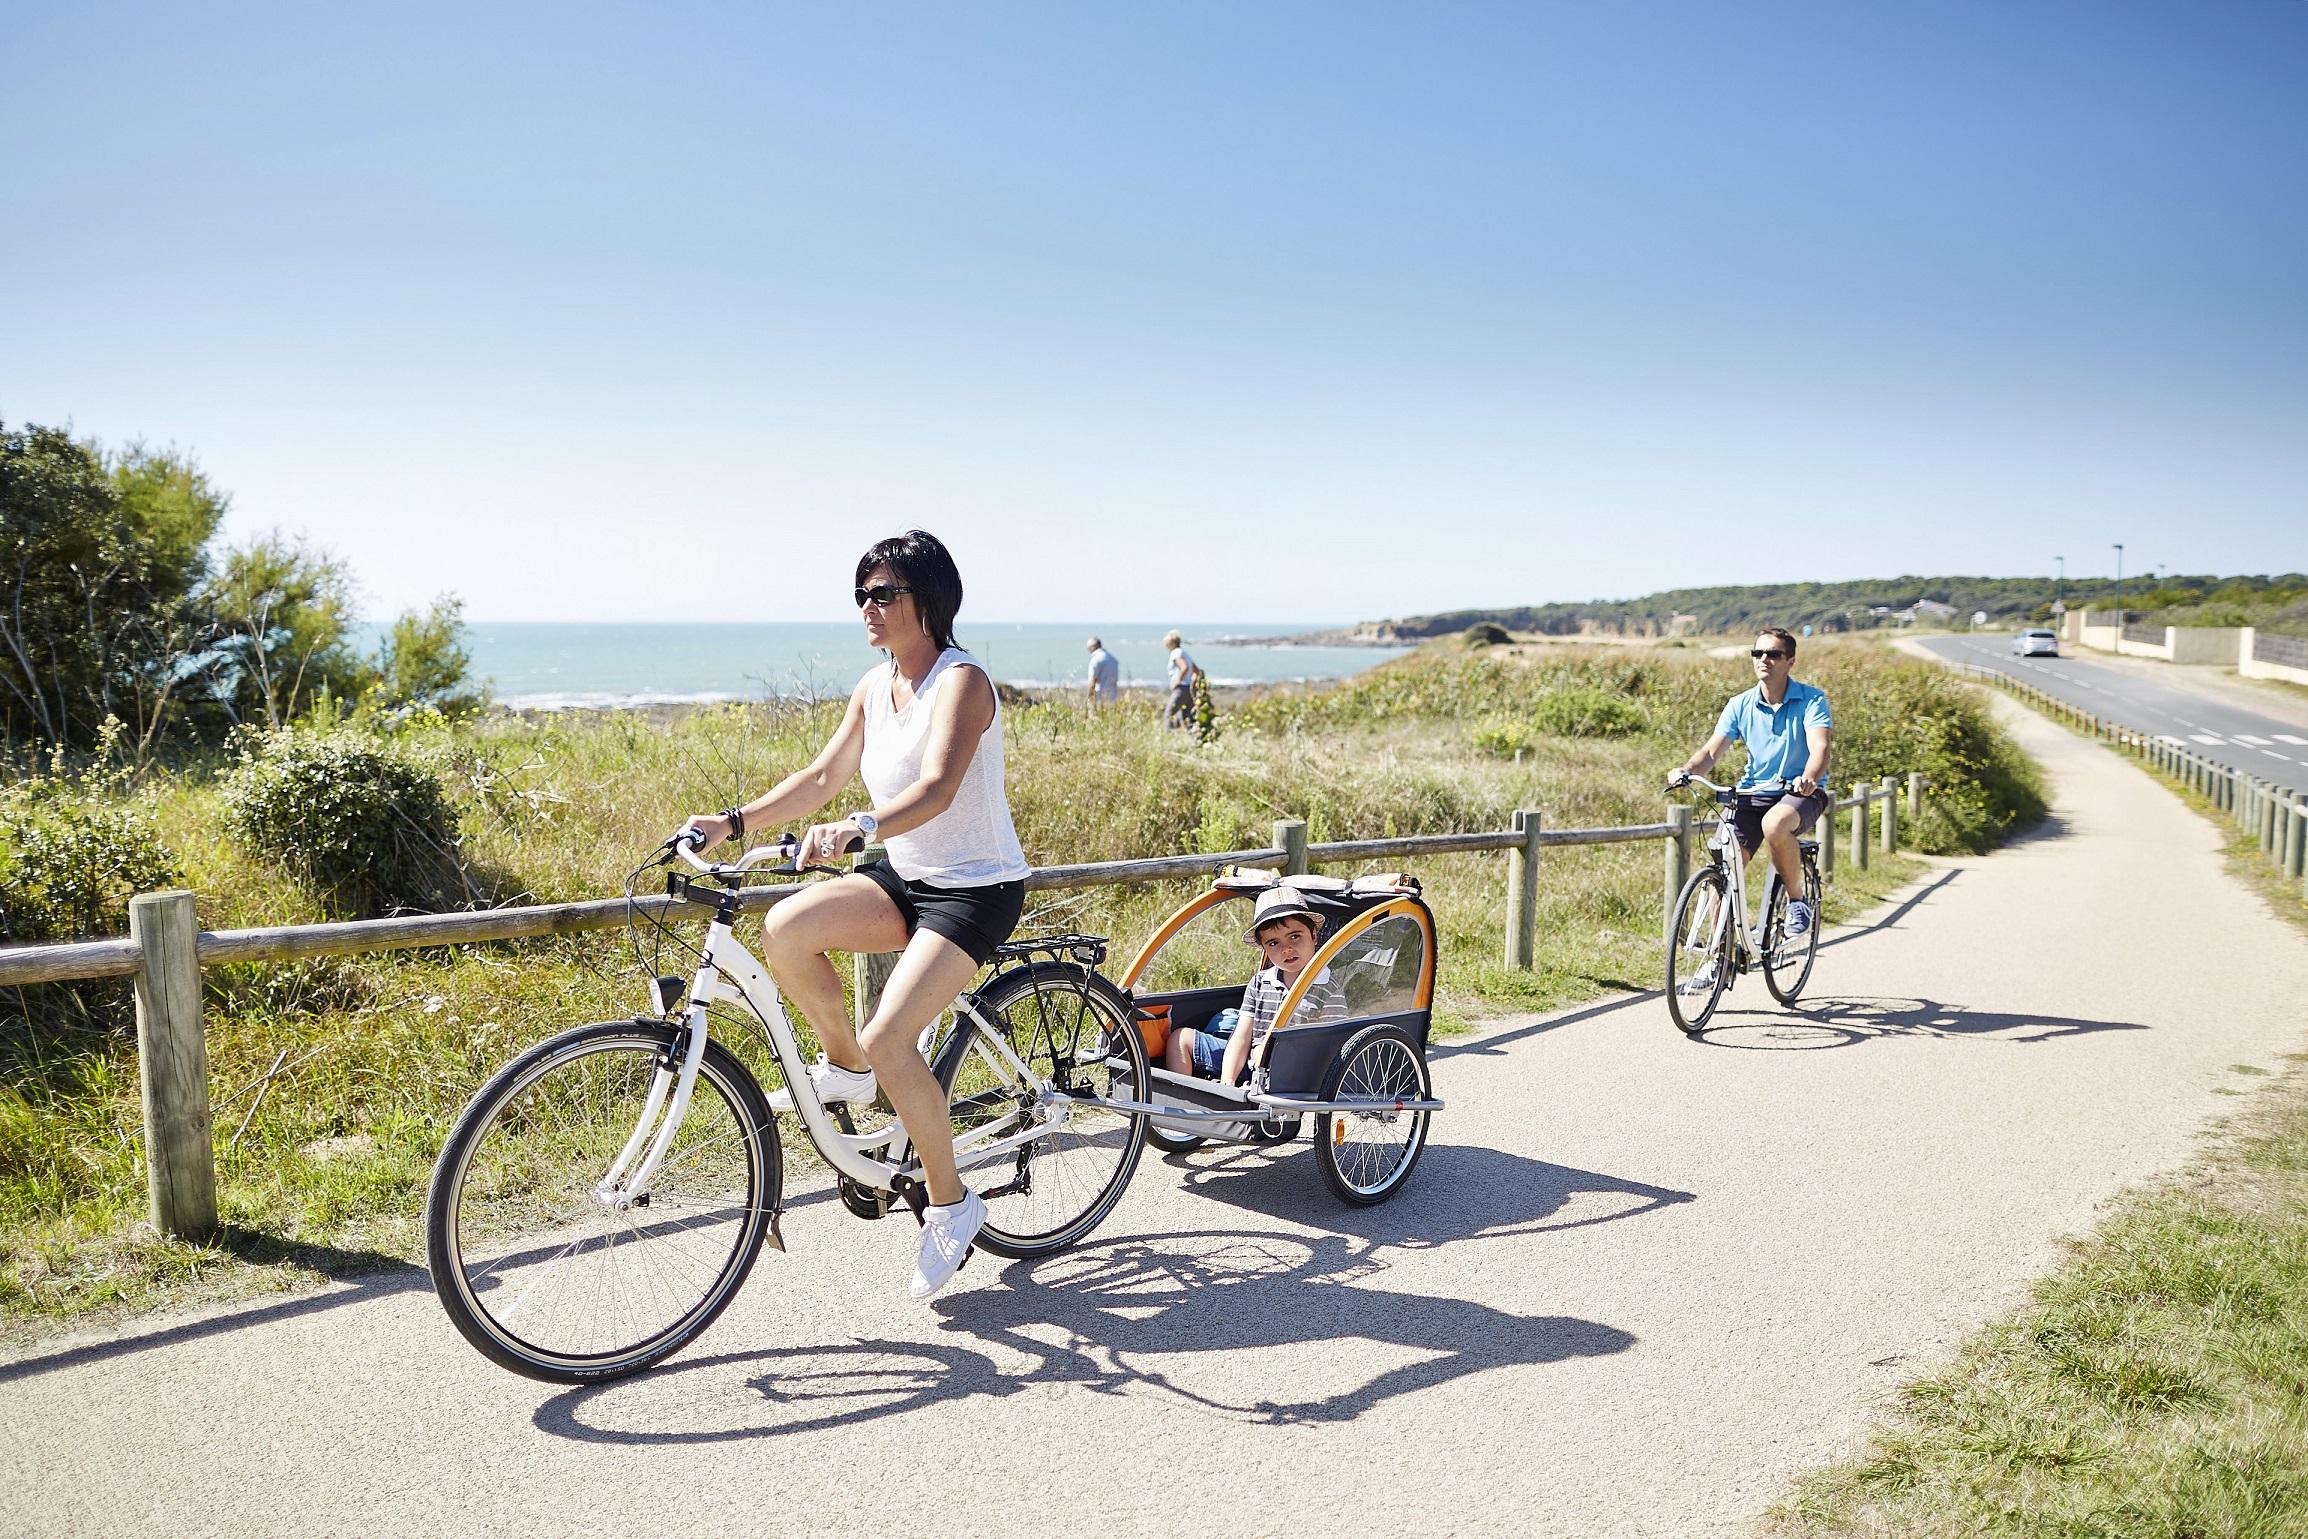 Vélodysée in Vendée (photo: A.Lamoureux)